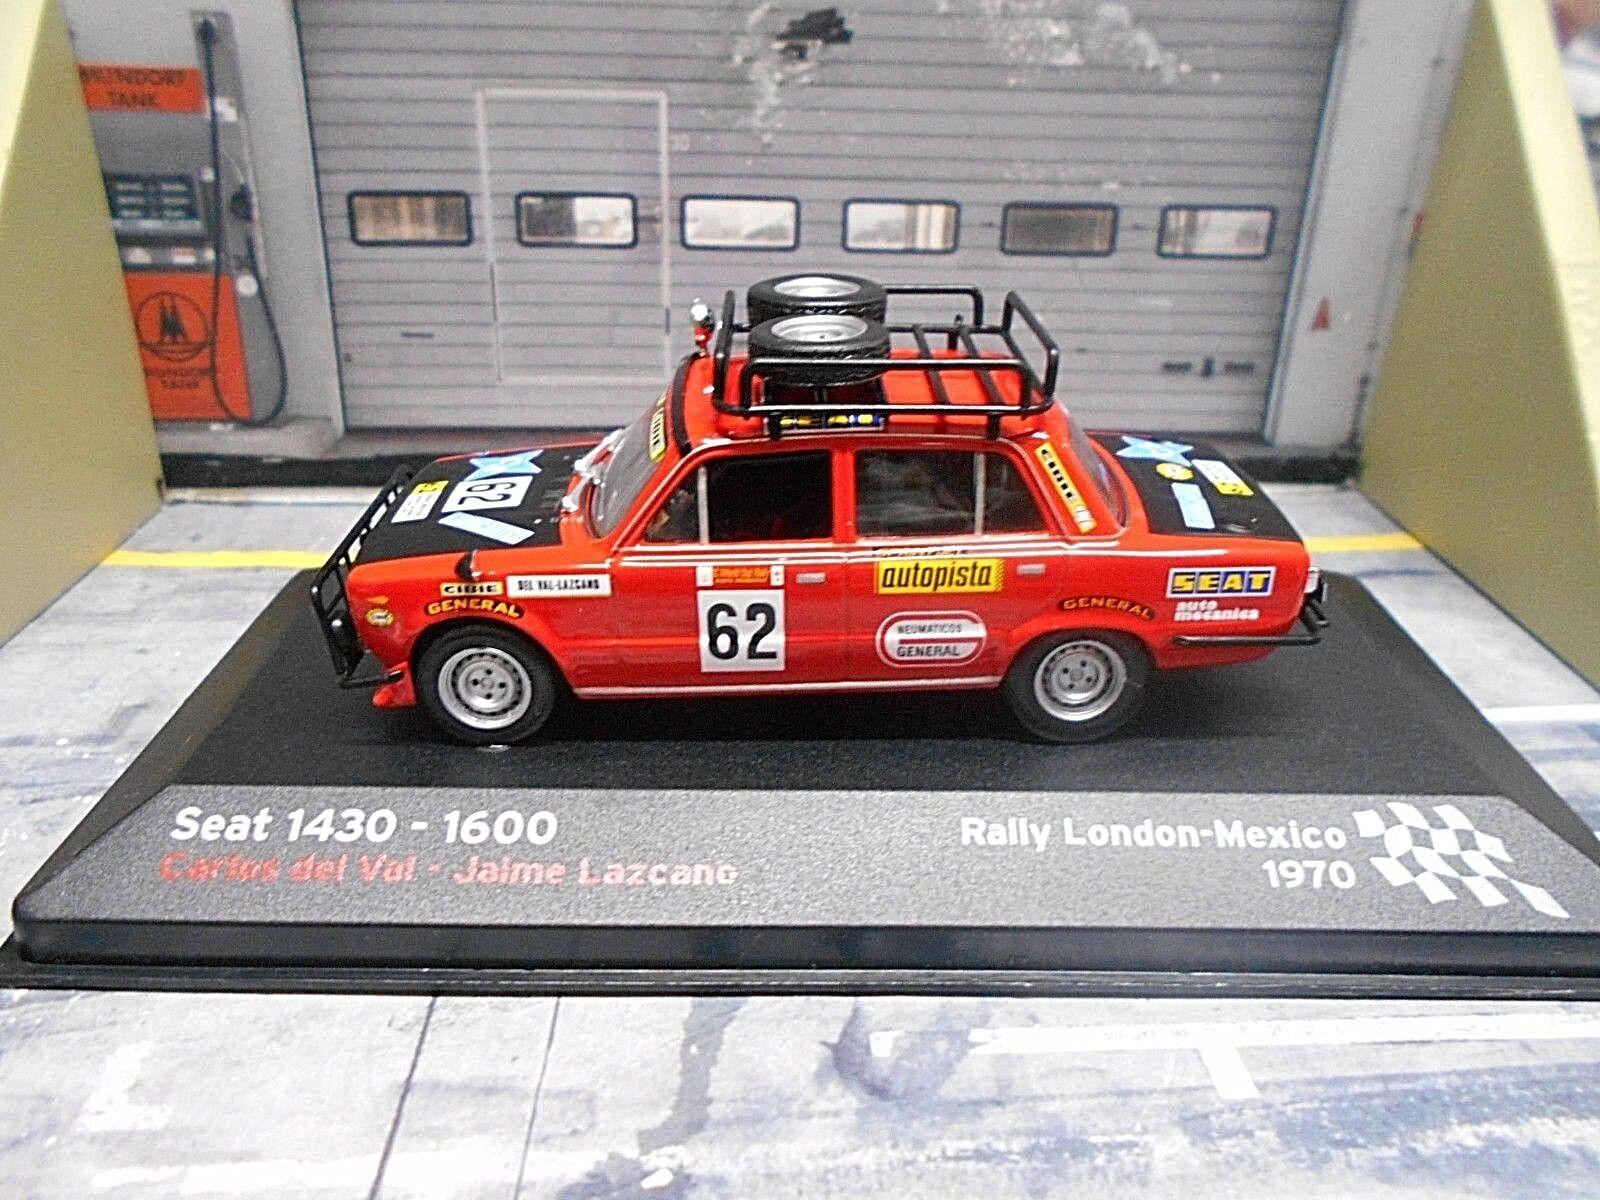 FIAT SEAT 1430 1600 RALLYE LONDRES MEXICO 1970  62 DEL VAL IXO ALTAYA 1 43